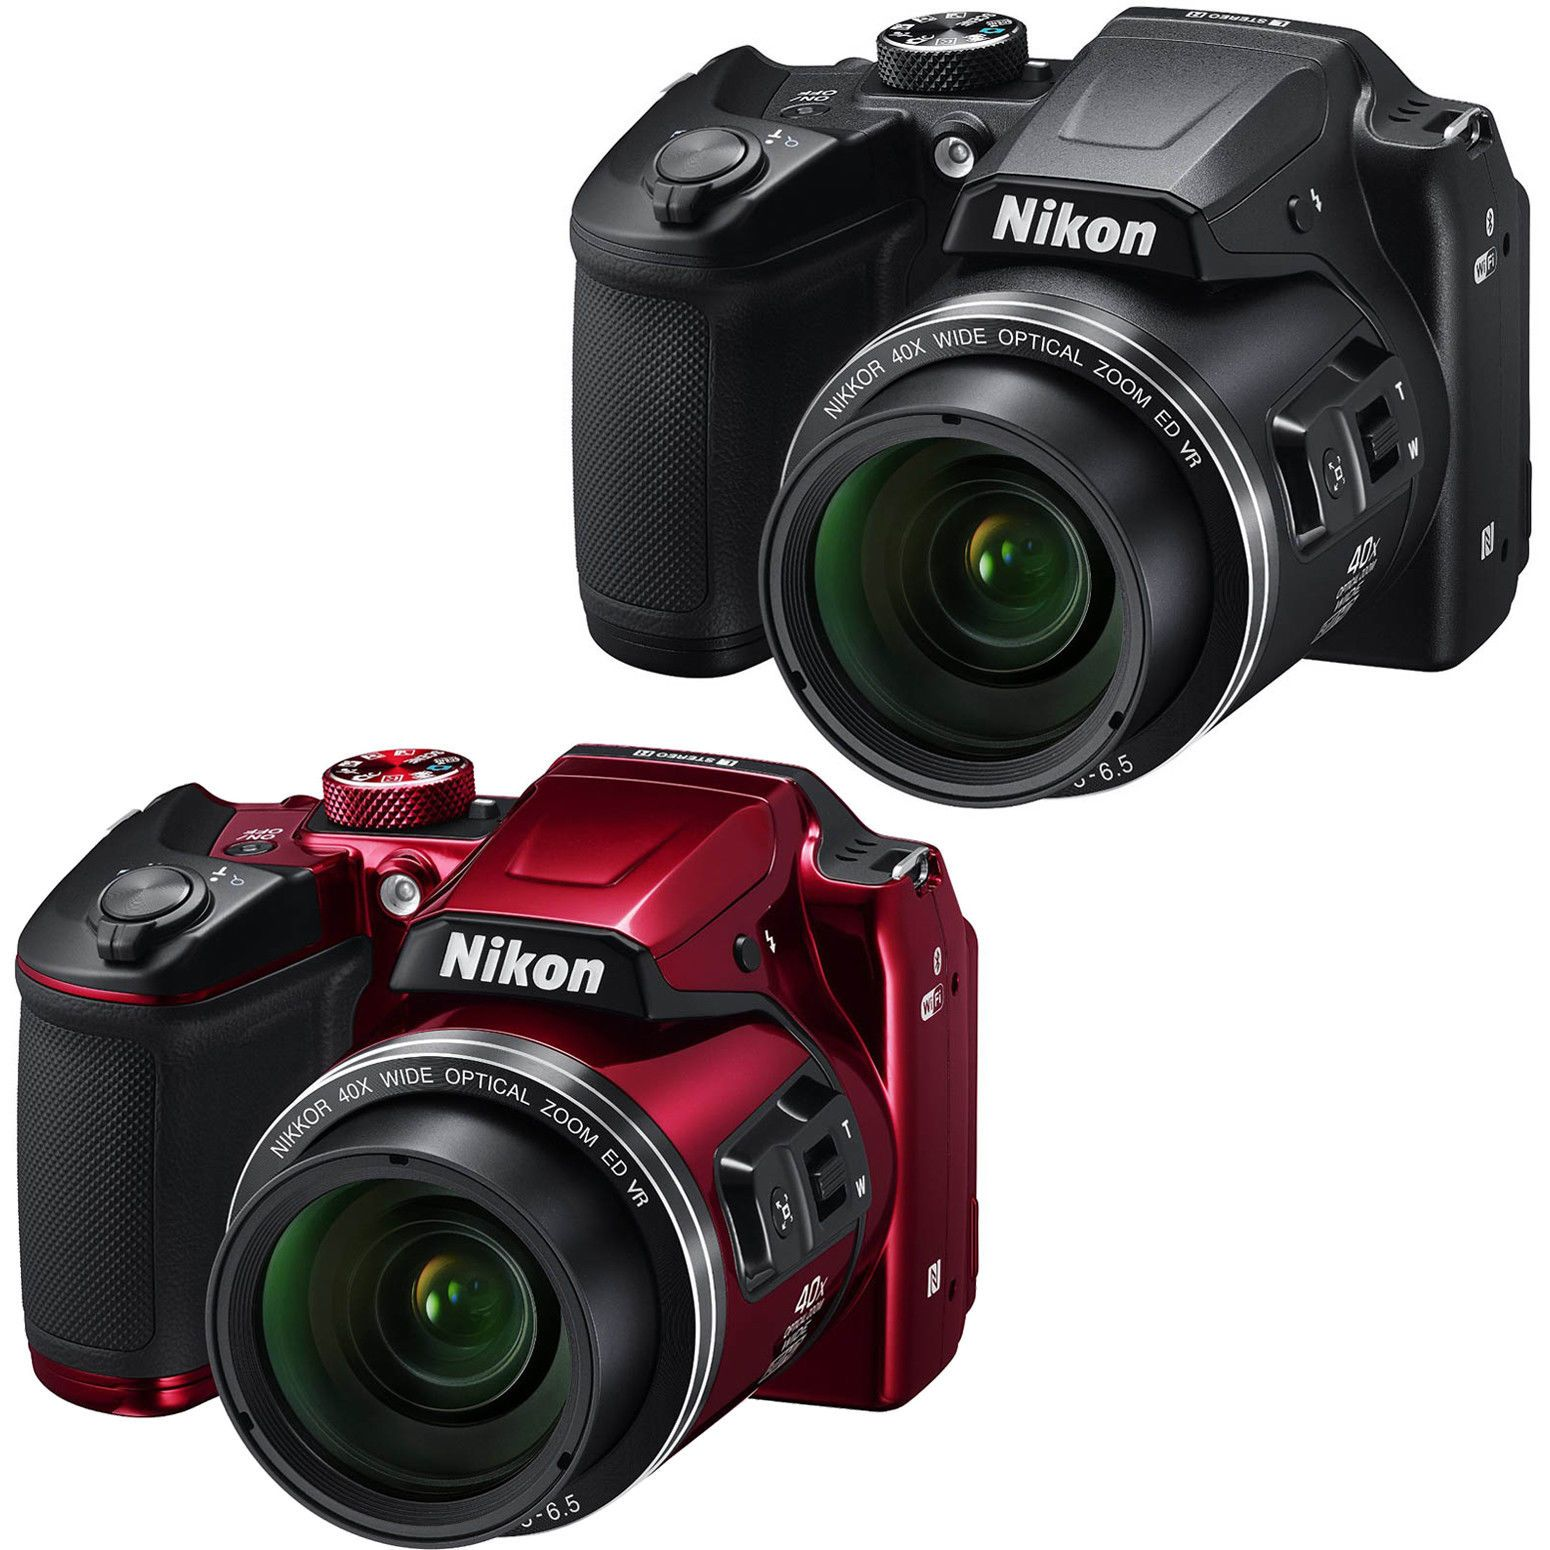 Details About Nikon Coolpix B500 16mp 40x Optical Zoom Digital Camera W Wifi Choose Color Nikon Coolpix B500 Nikon Coolpix Coolpix B500